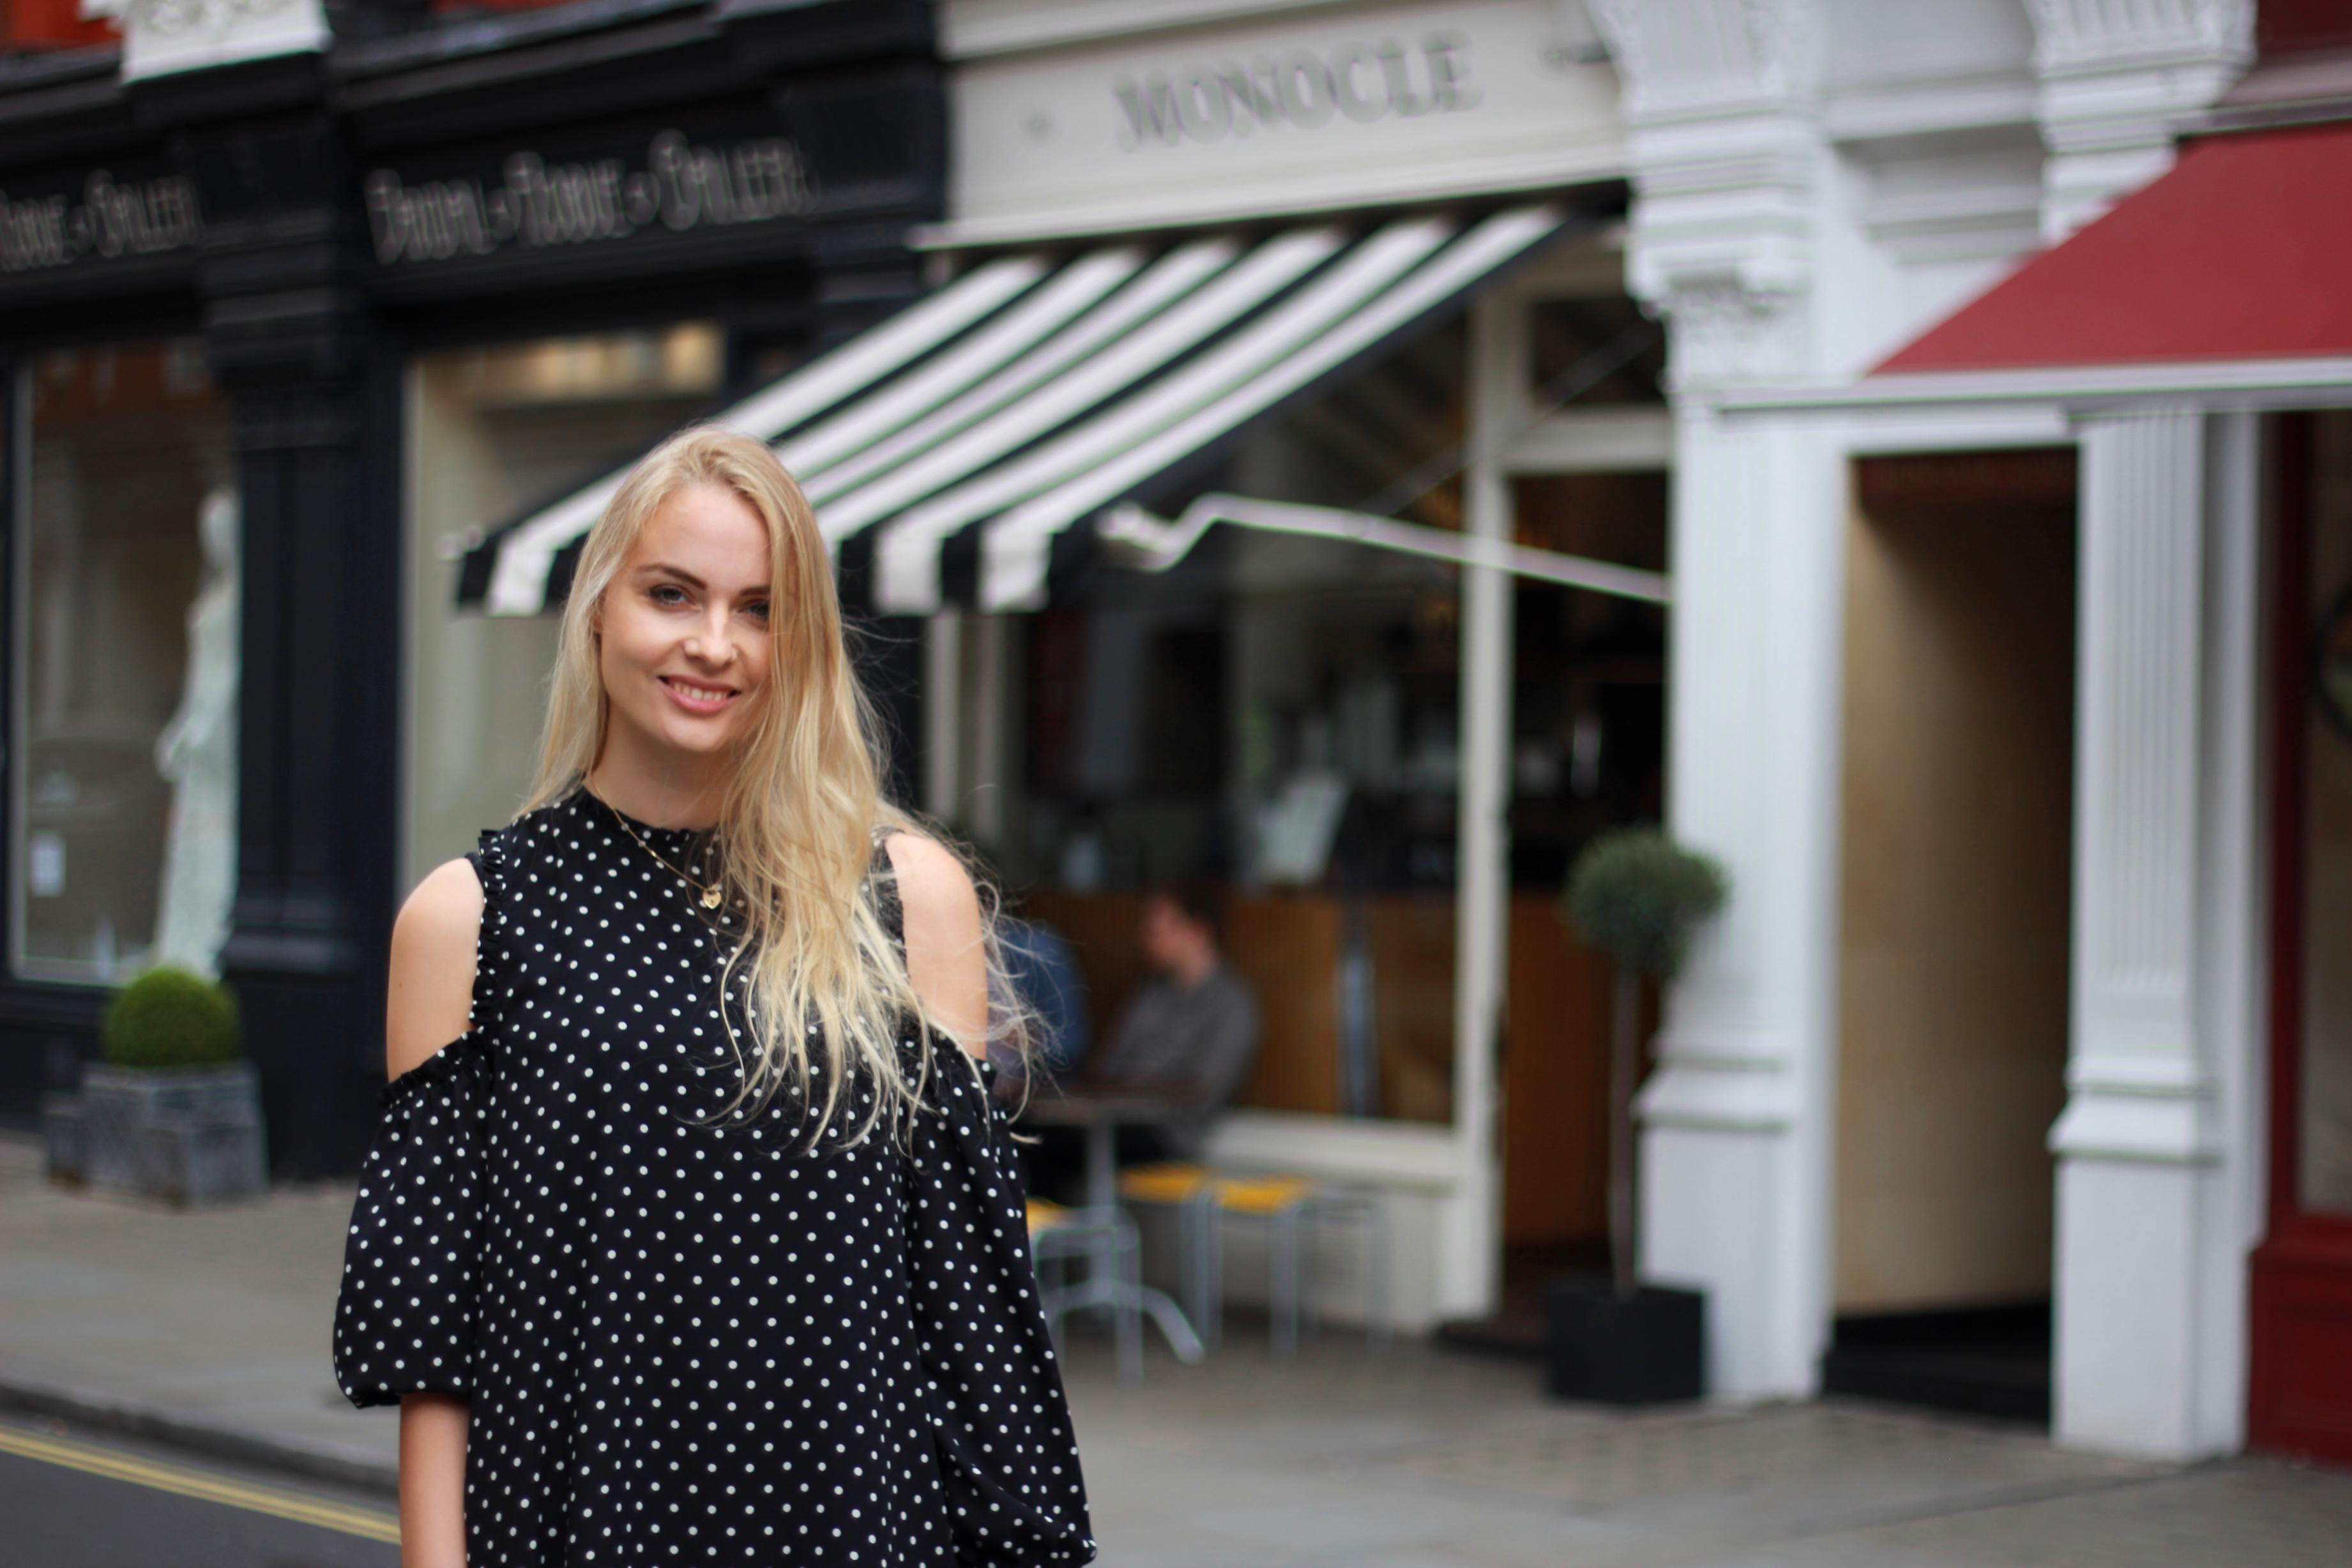 monocle-cafe-london-6